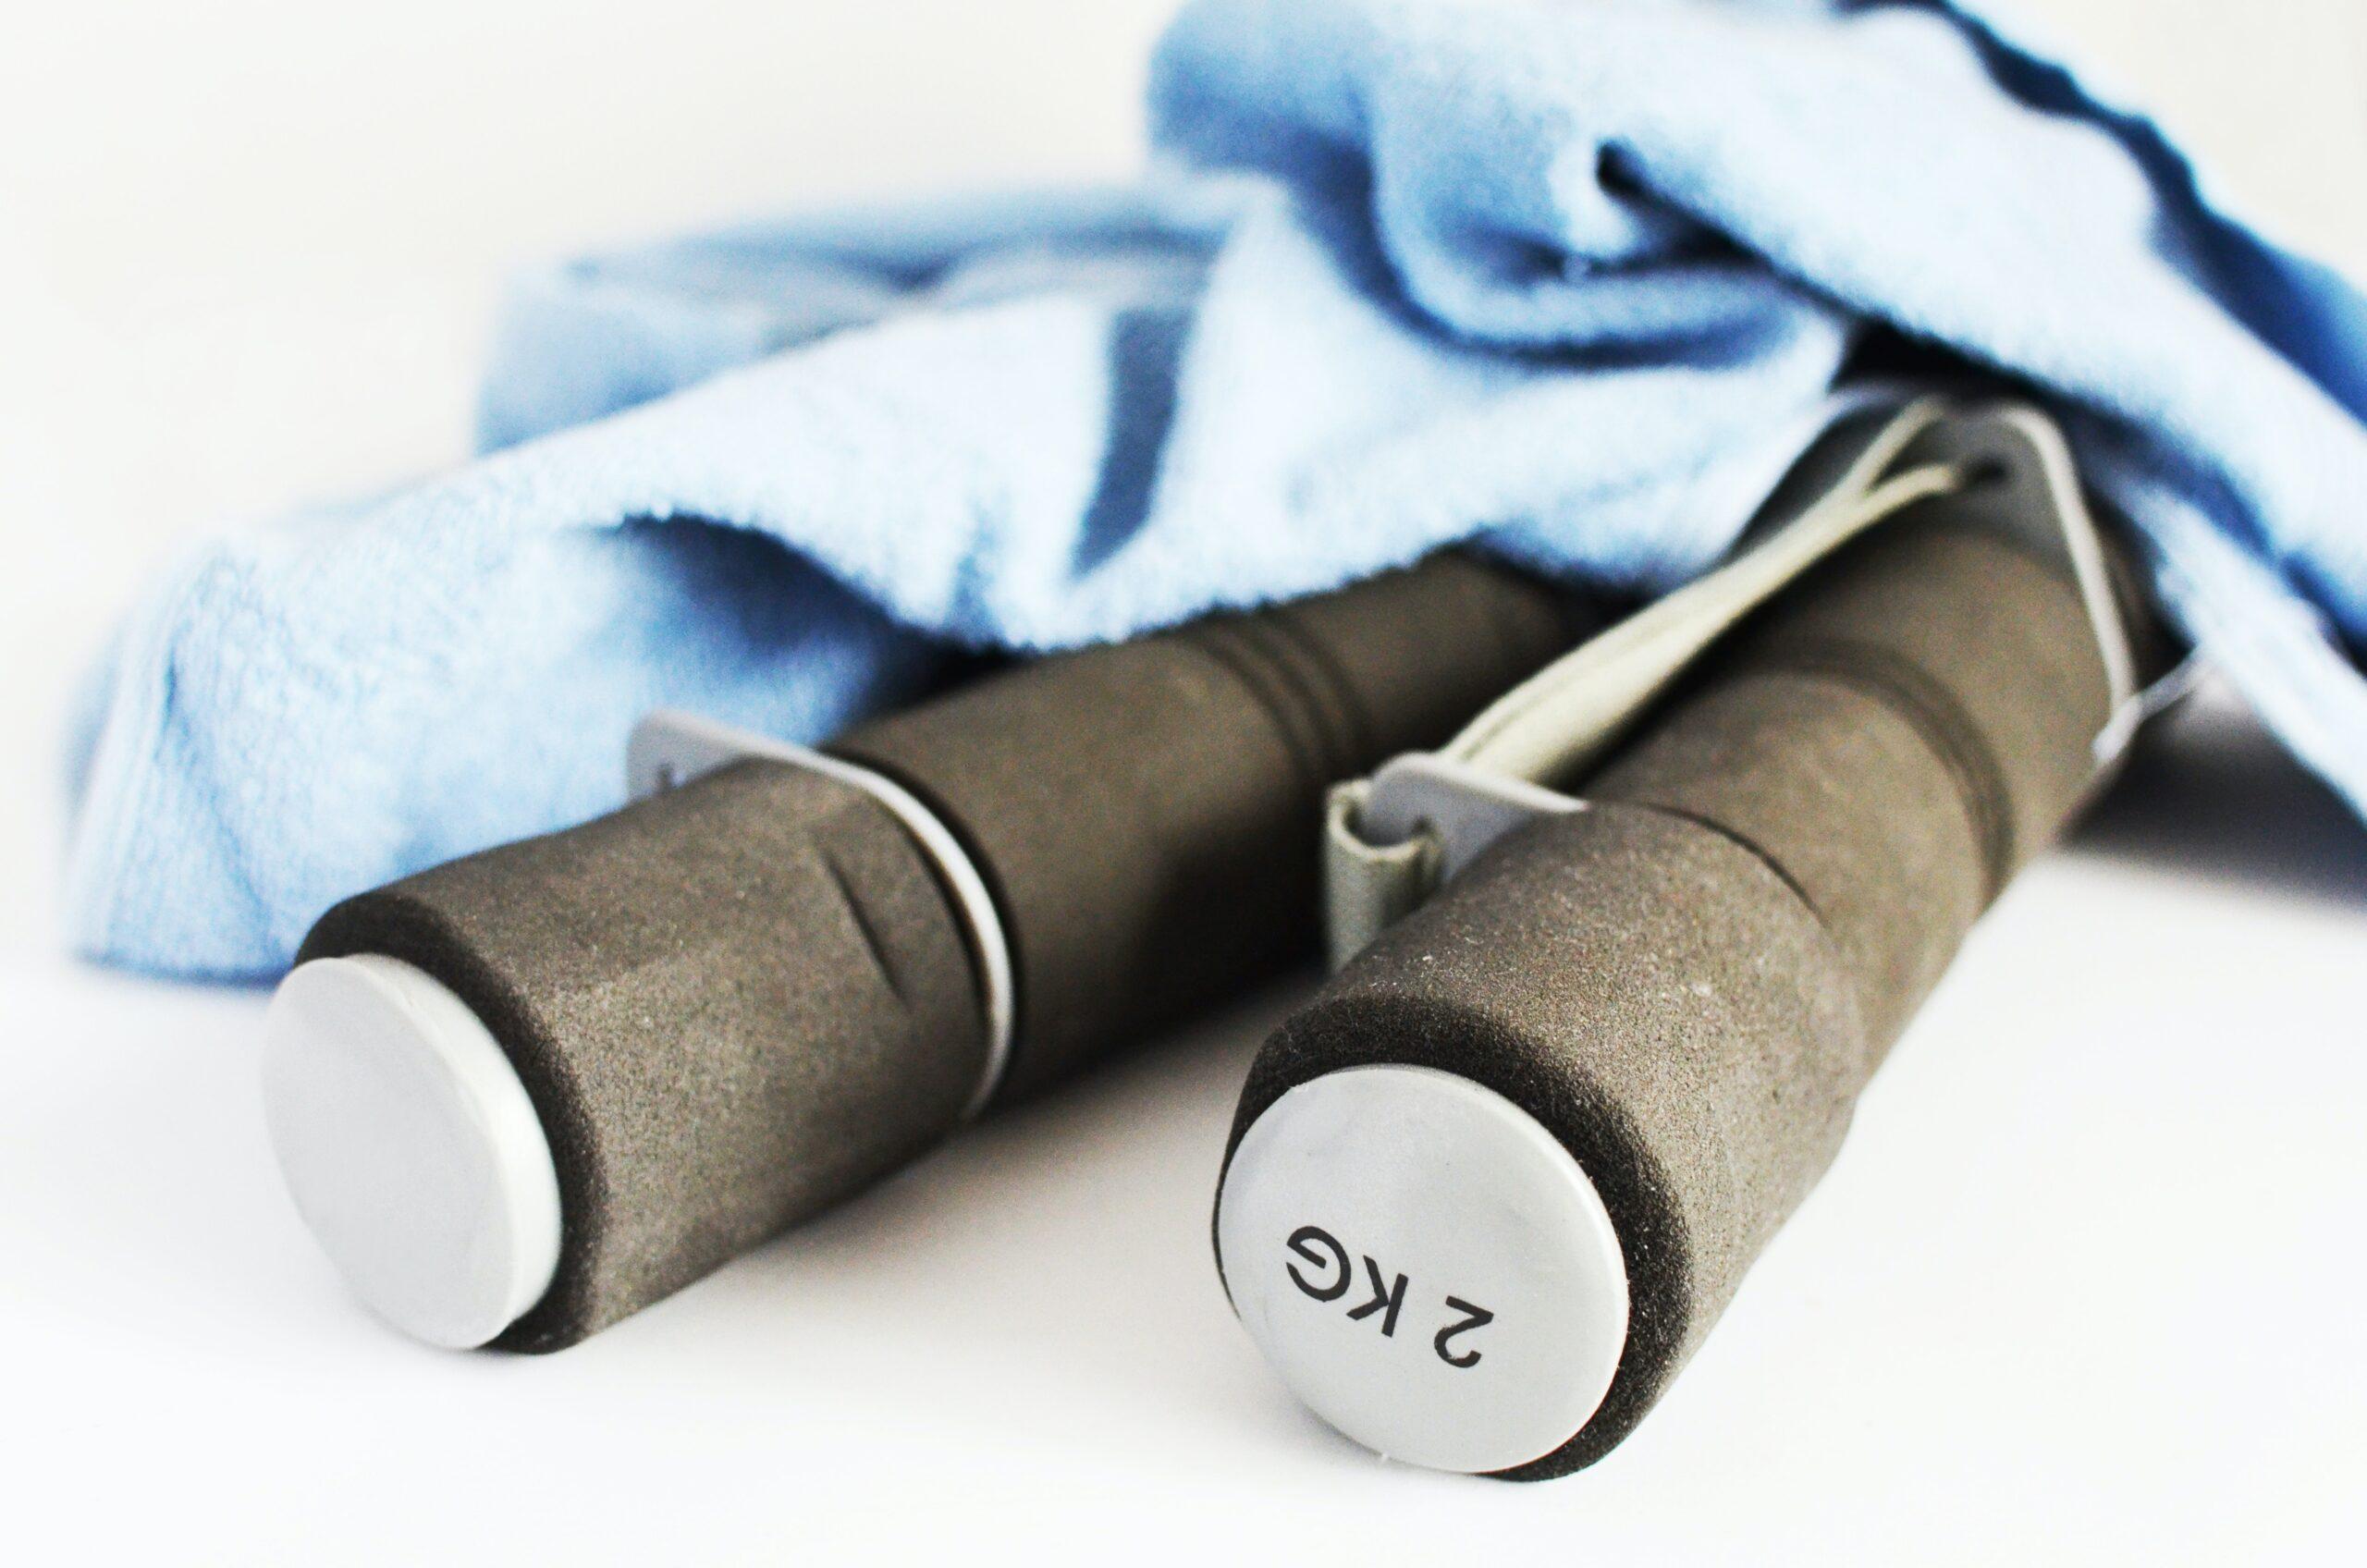 sport-fitness-workout-resolution-3235